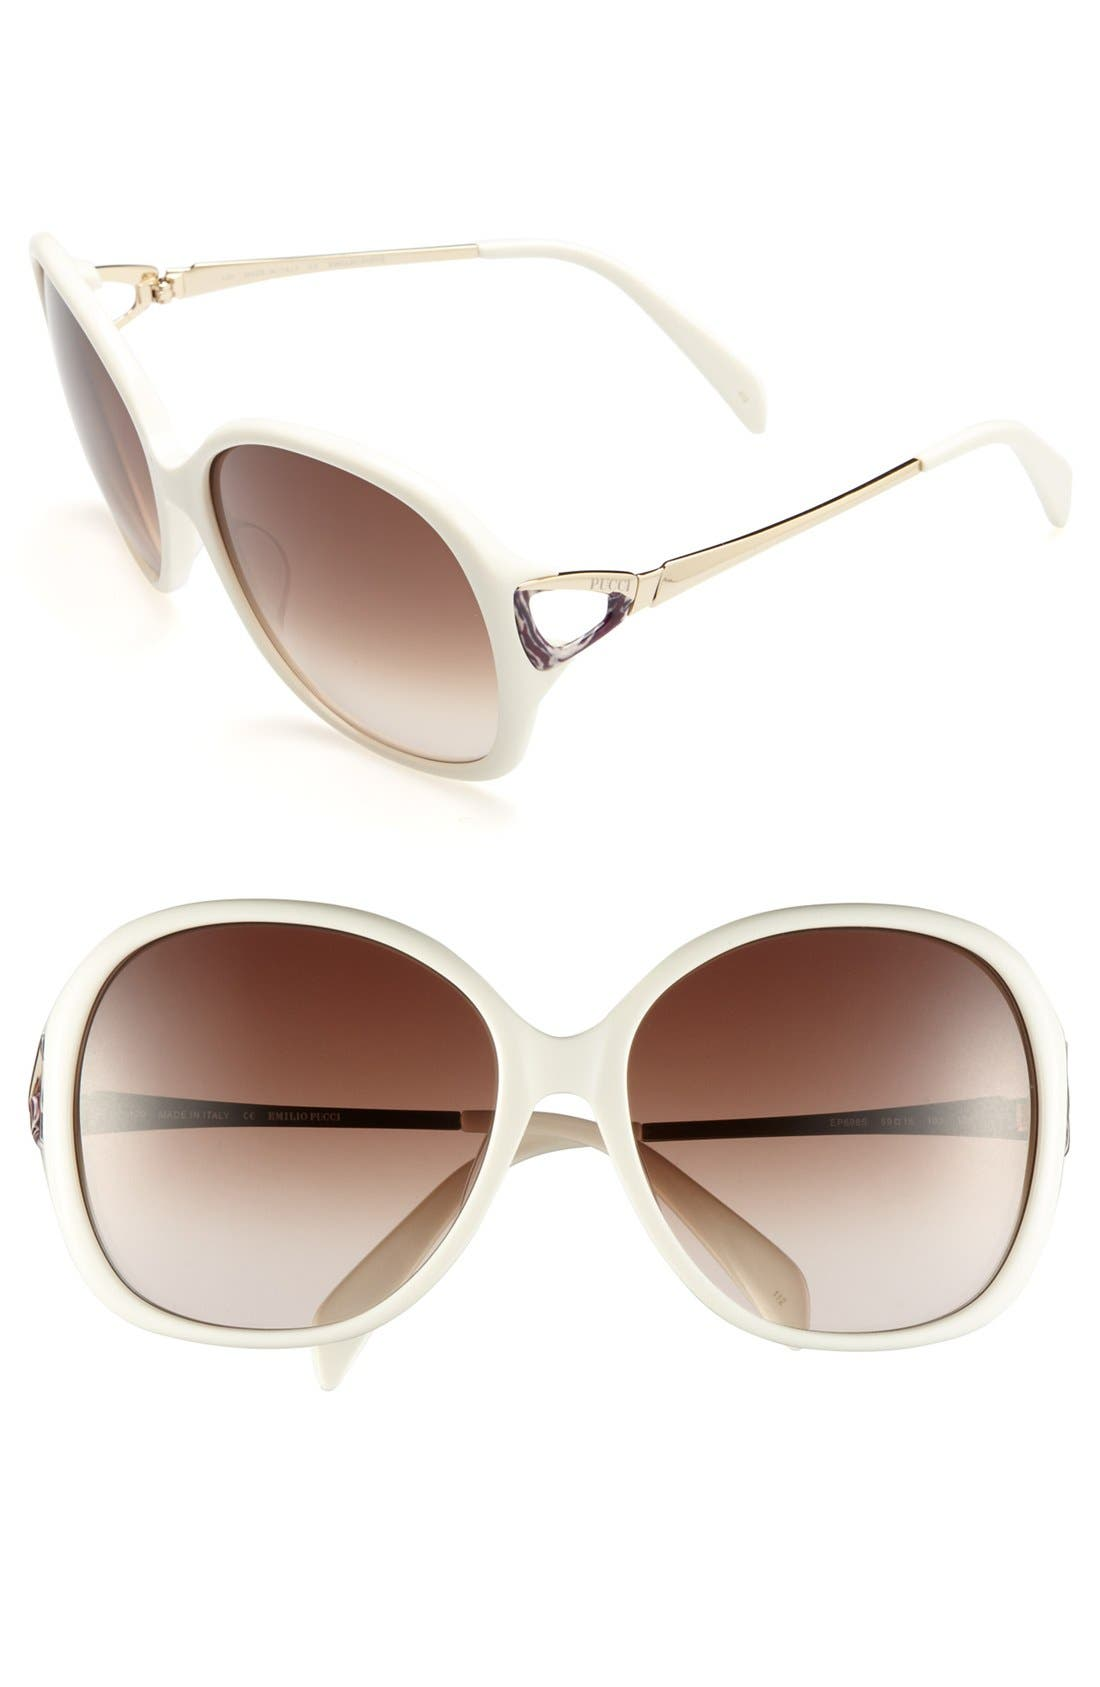 Main Image - Emilio Pucci 59mm Sunglasses (Special Purchase)